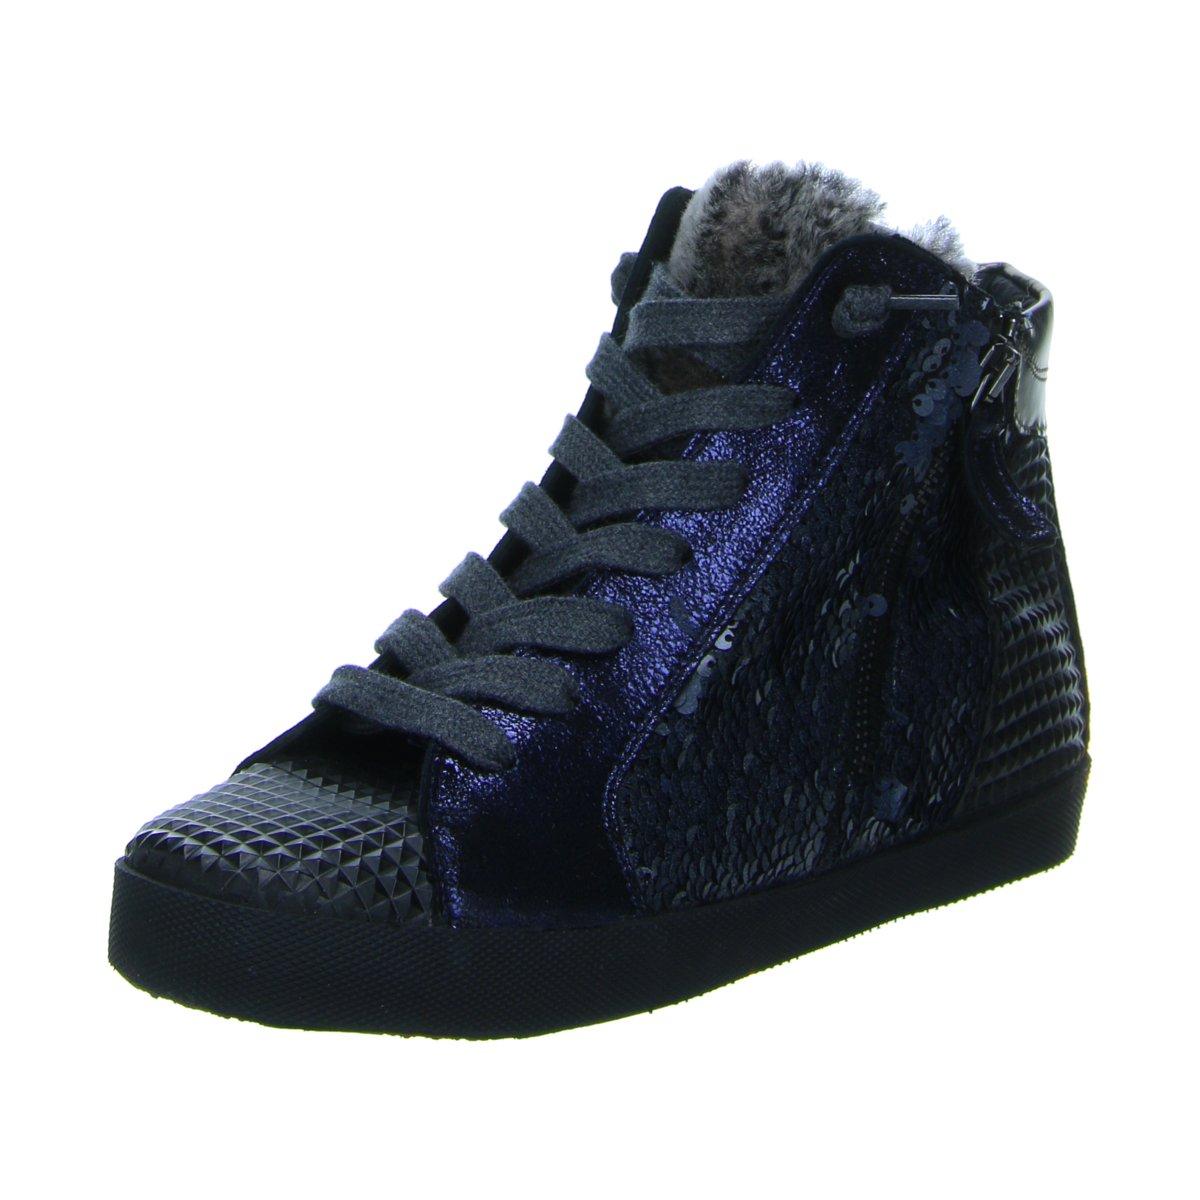 NEU Donna Carolina Damen Sneaker Mix Stone 32402052 005 blau 199737